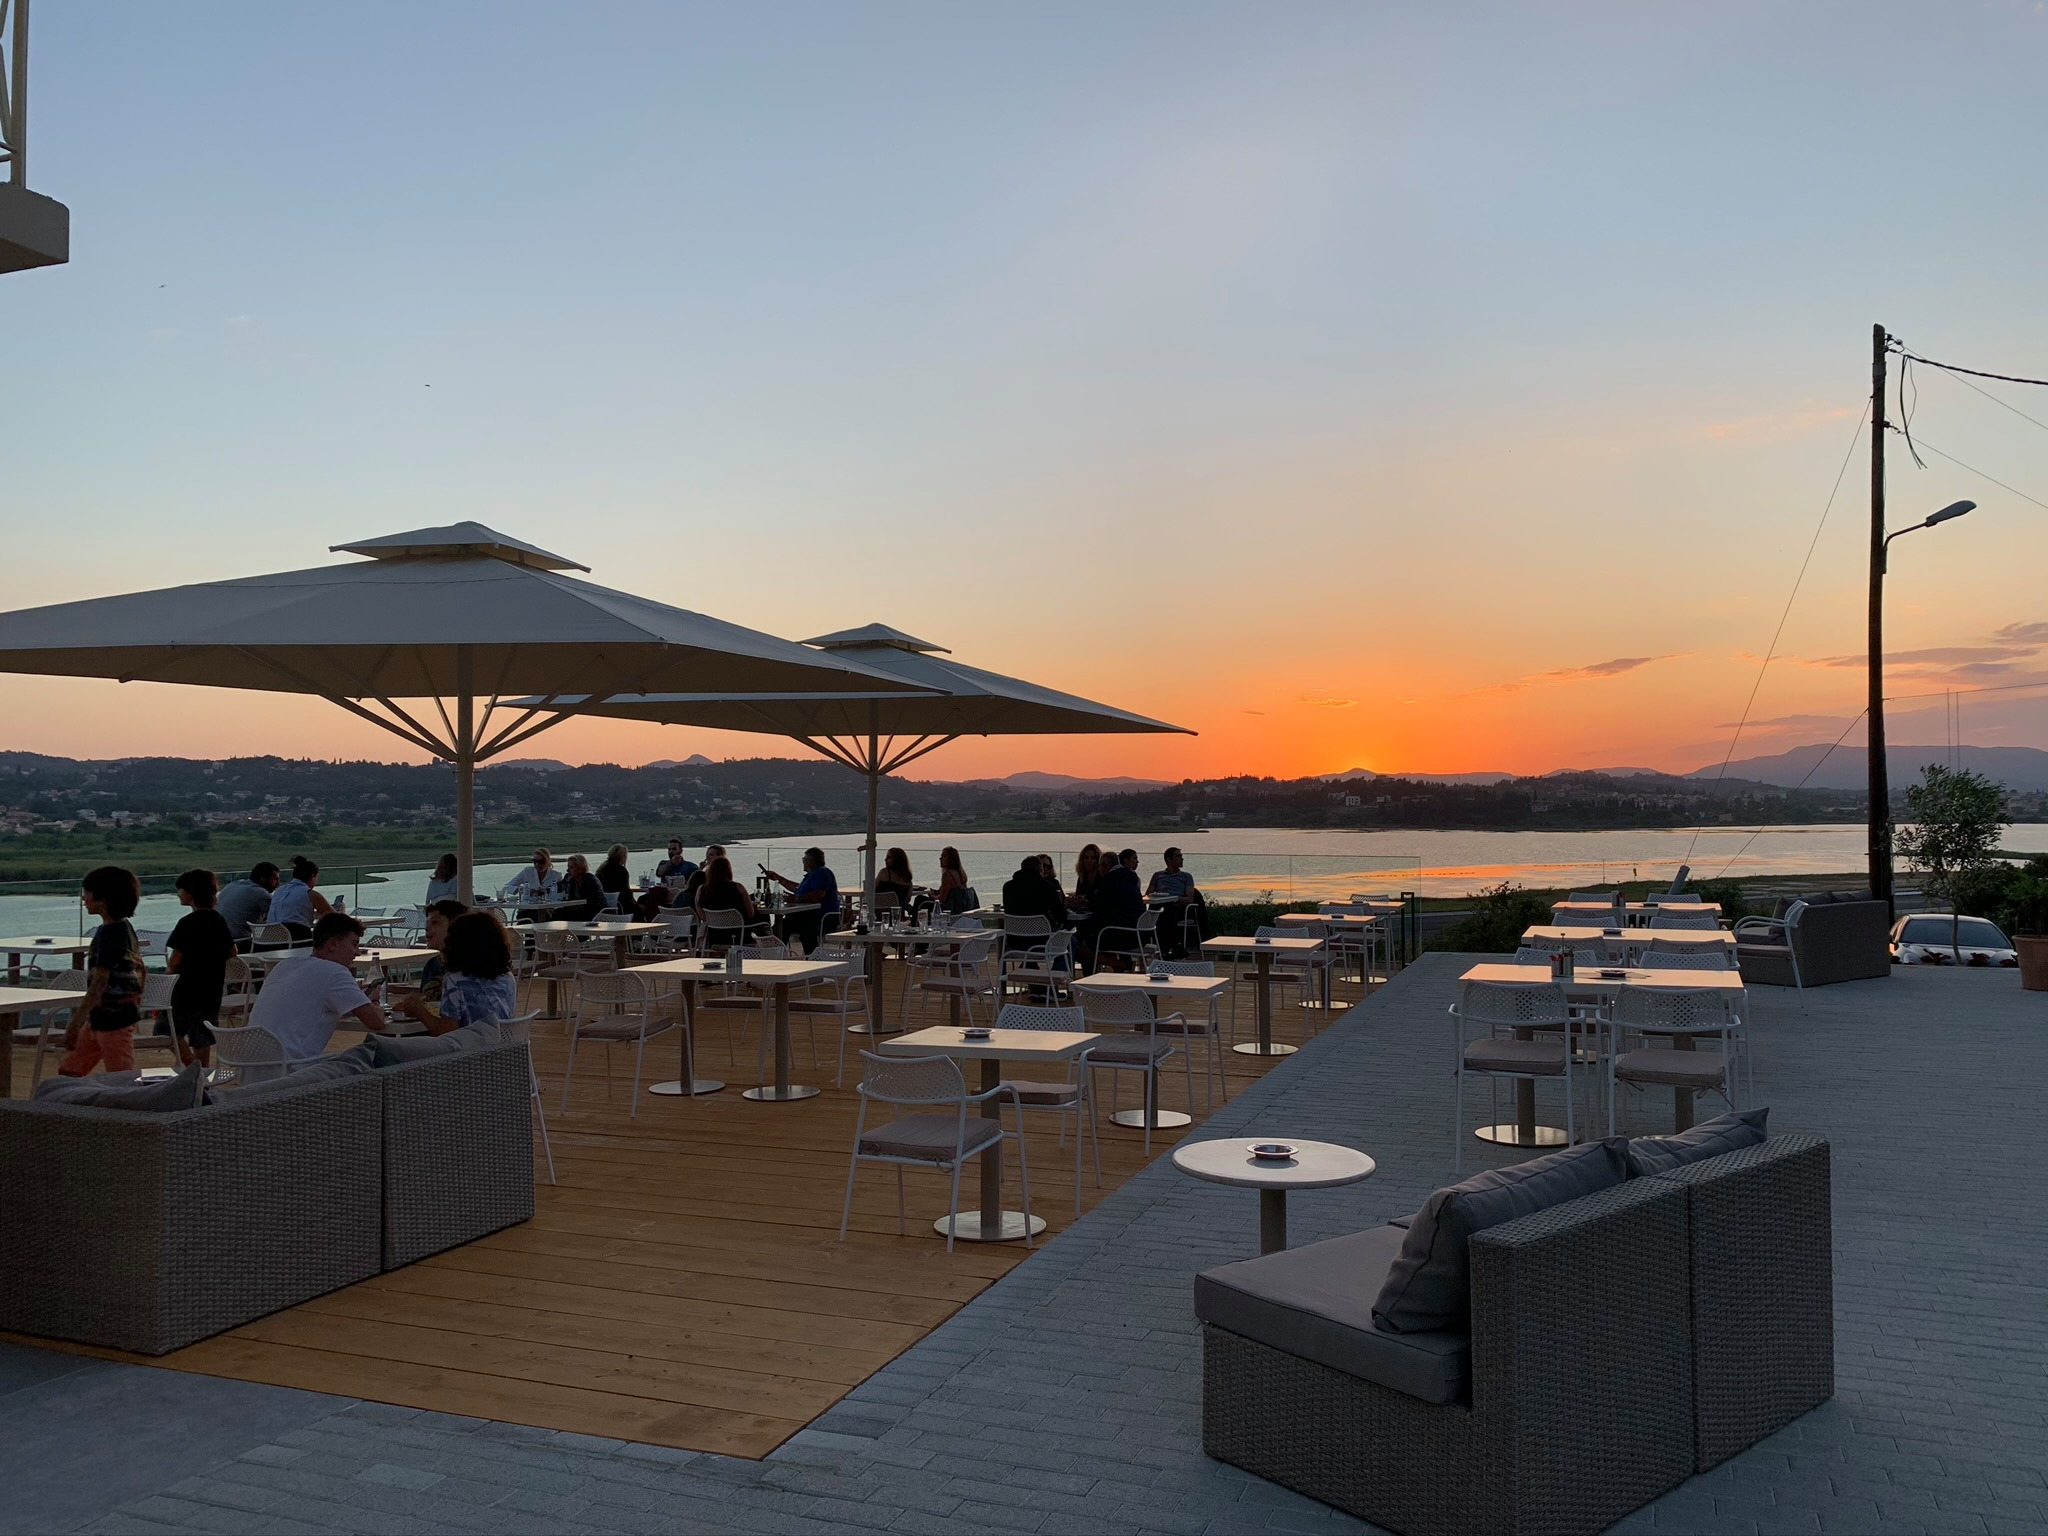 Skyview All day place (5) Corfu-Kanoni Κέρκυρα | corfugreece.gr